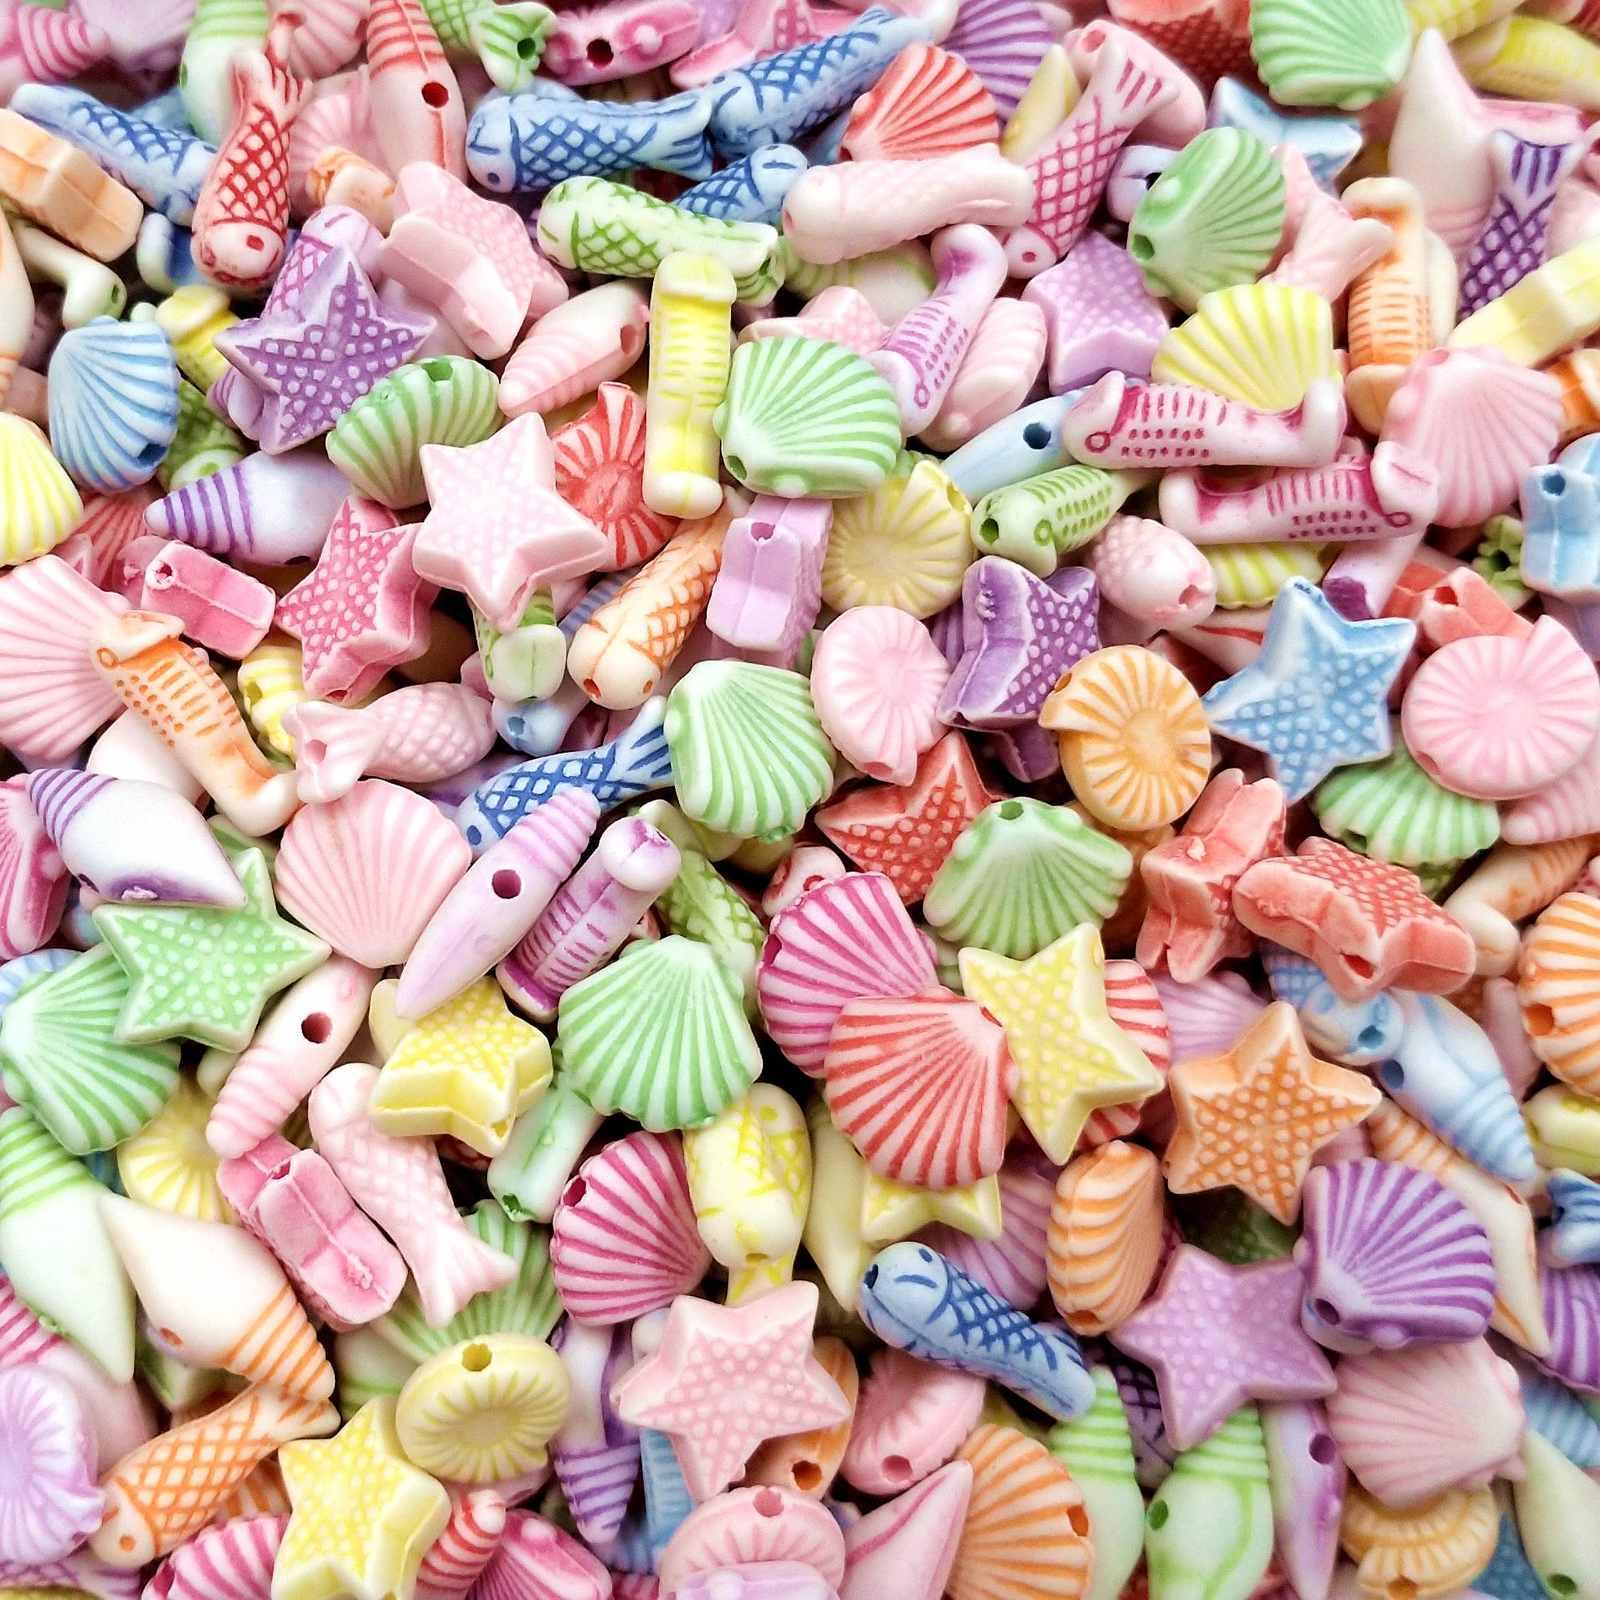 Contas Infantis Coloridas Tema Mar - Pacote 70 unidades